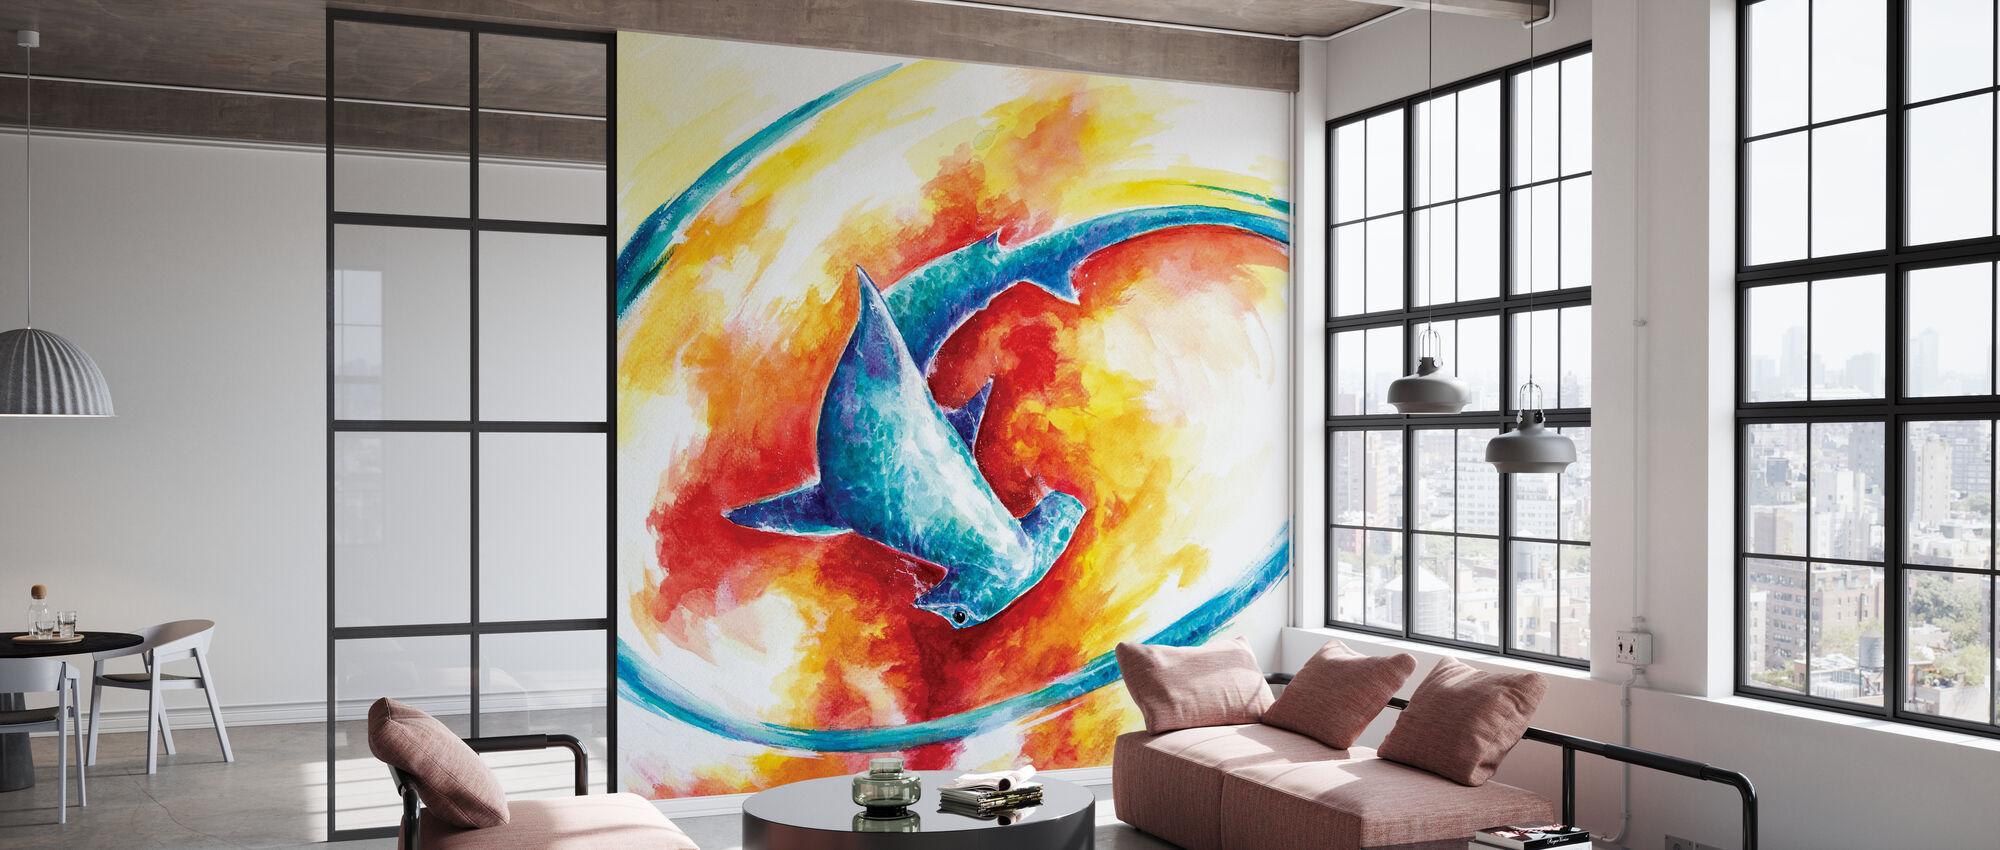 Ember - Wallpaper - Office